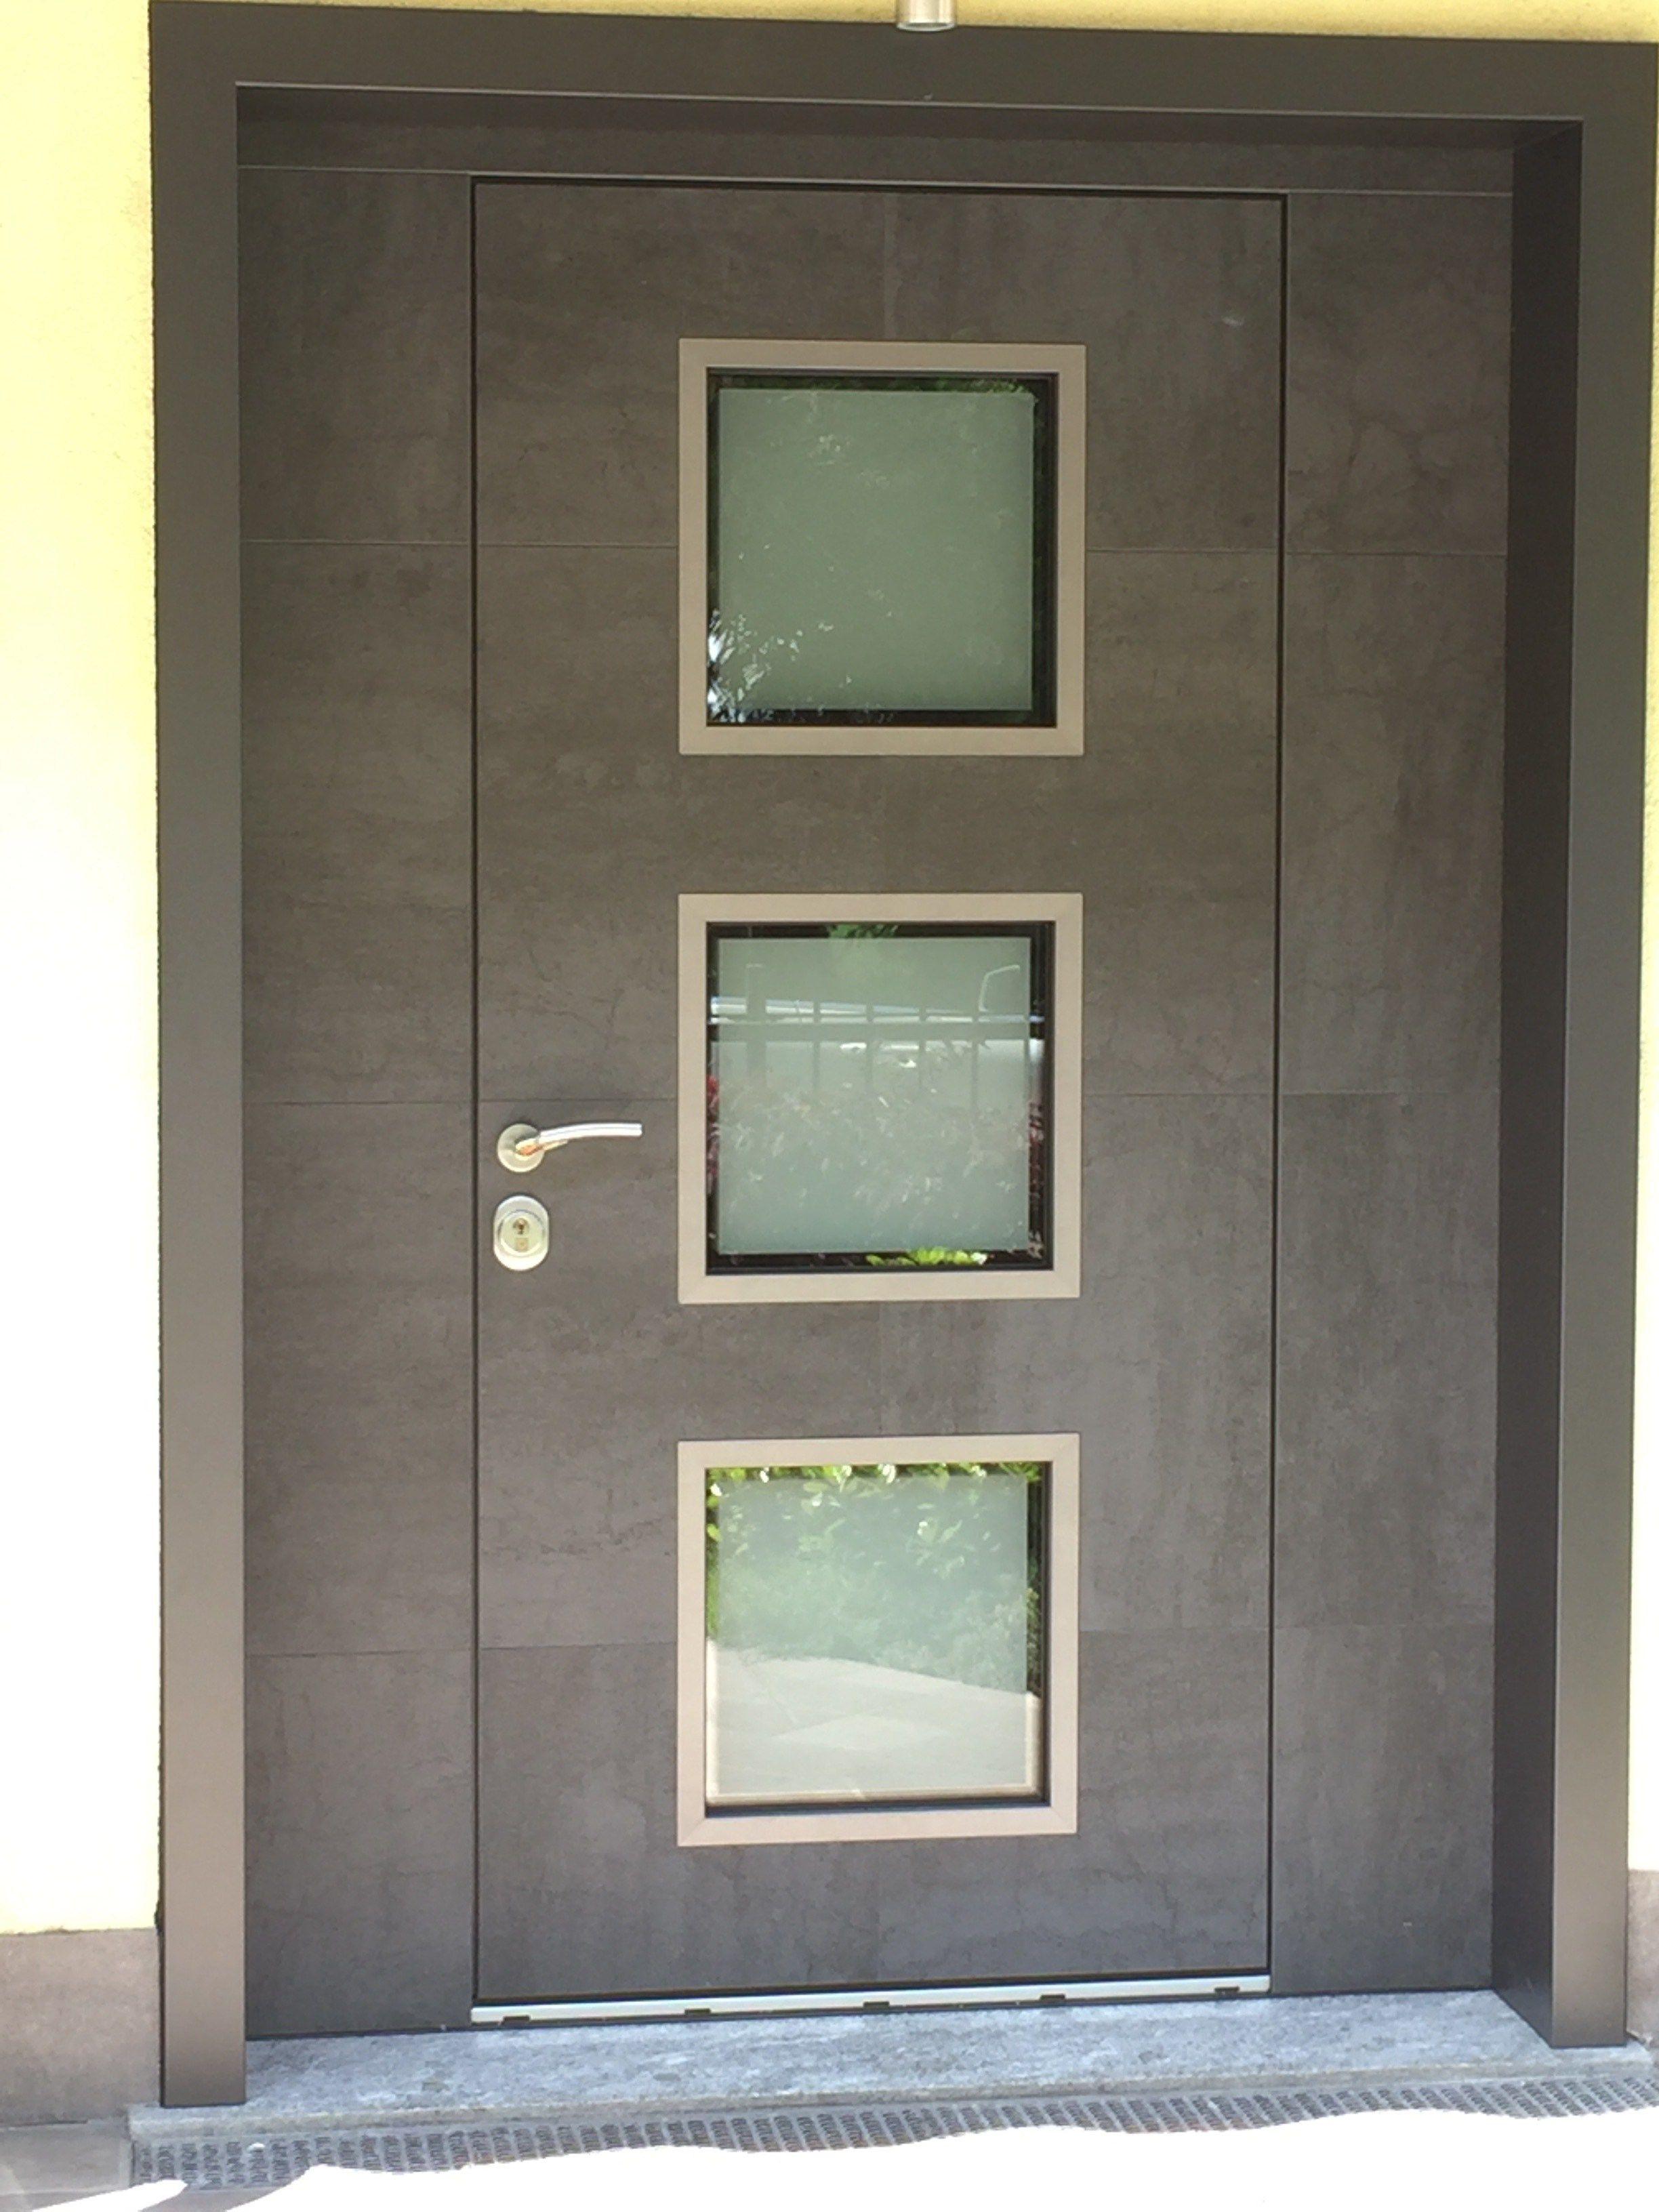 Porta d 39 ingresso blindata con pannelli in vetro frame by - Porta ingresso blindata ...